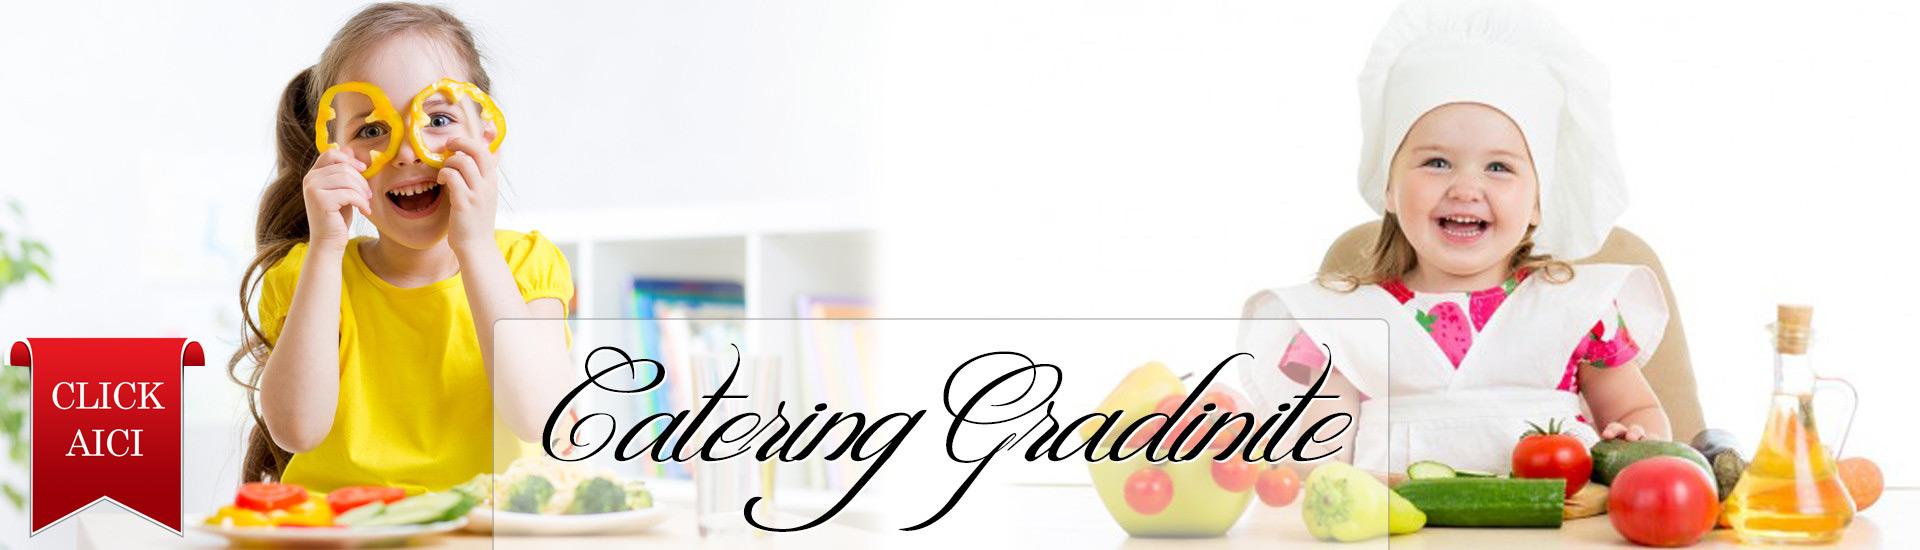 Catering Gradinite